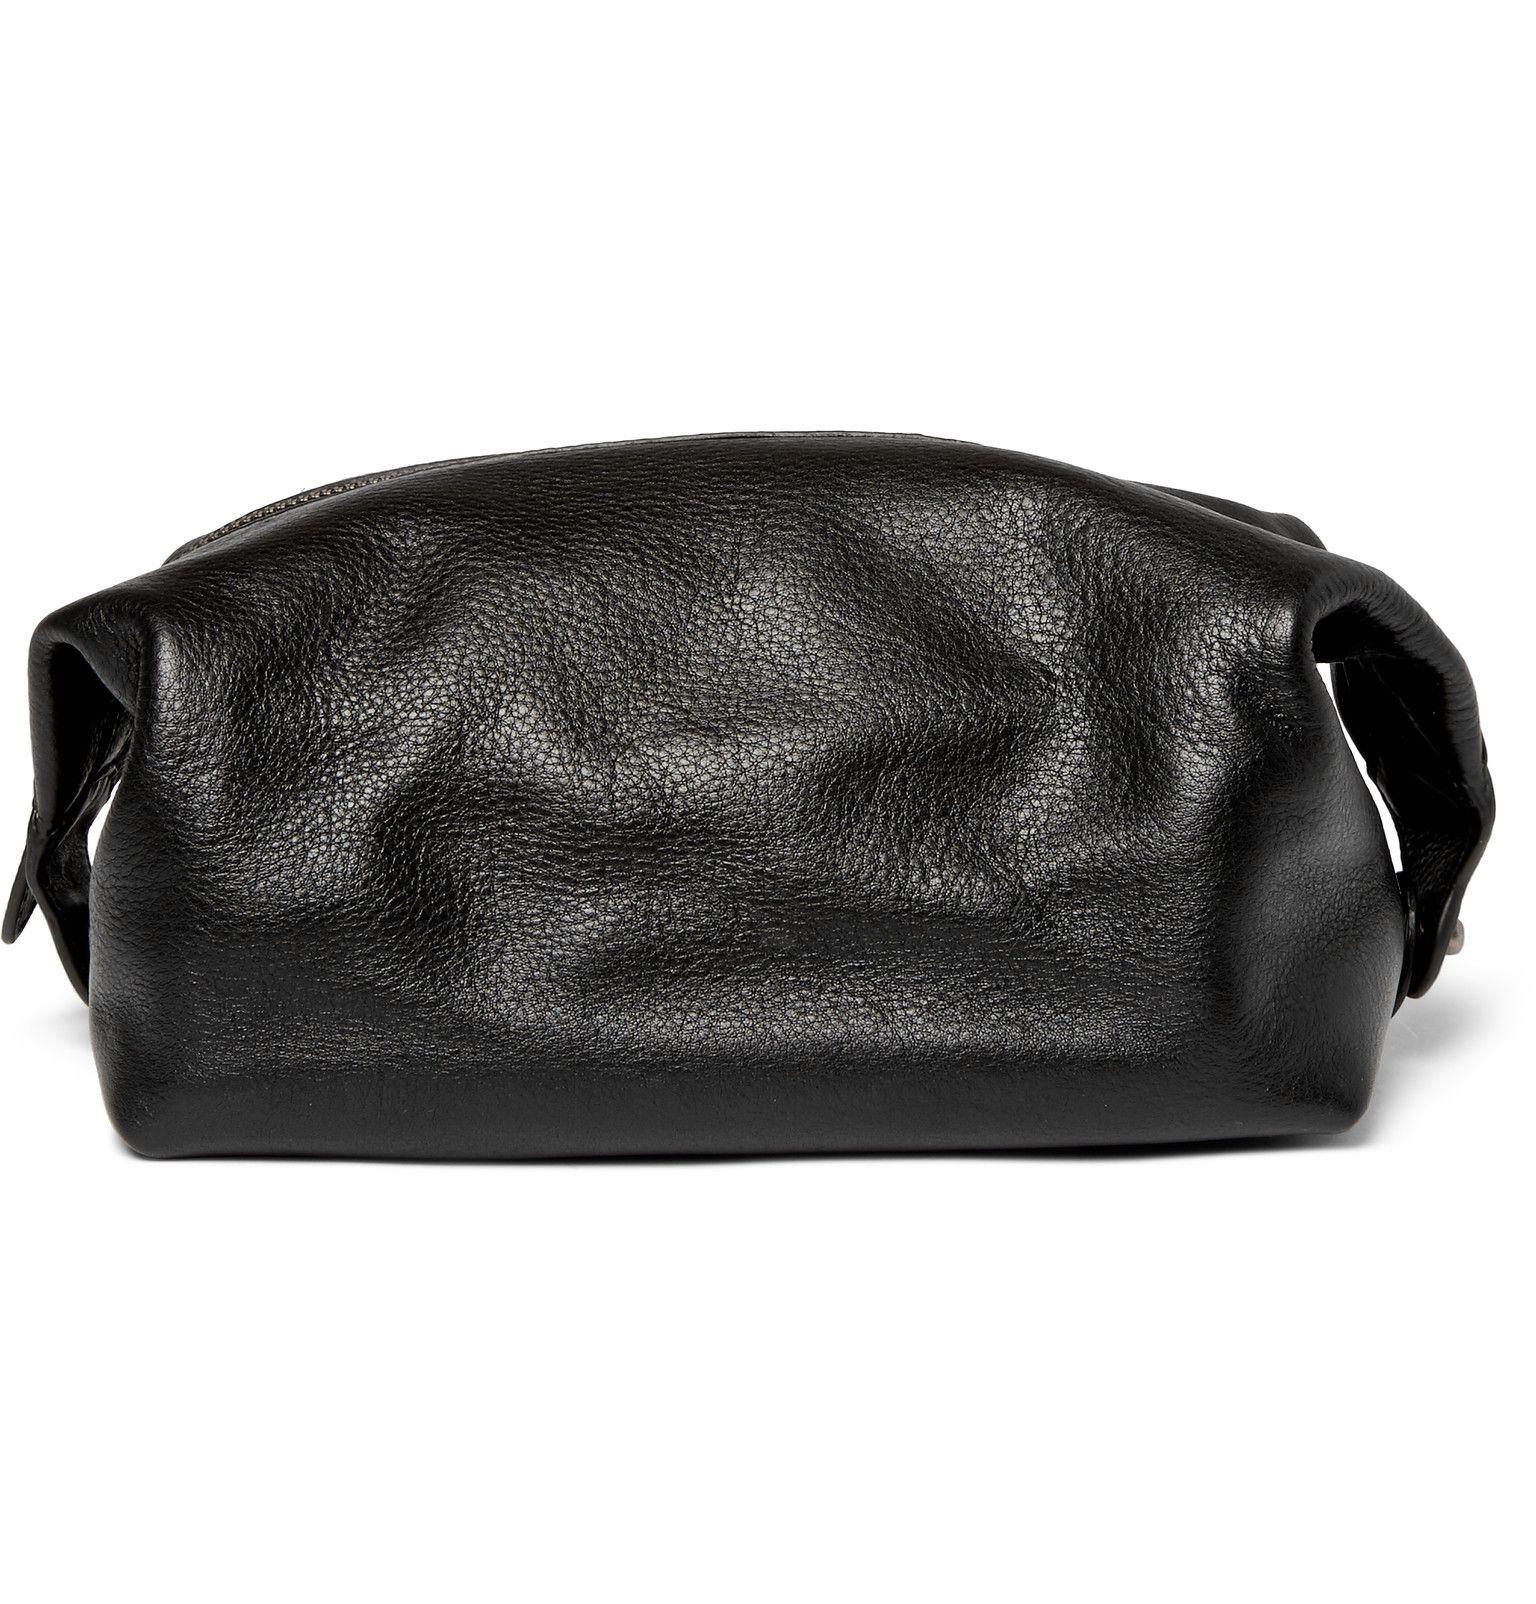 a615f657366e Polo Ralph Lauren - Full-Grain Leather Wash Bag